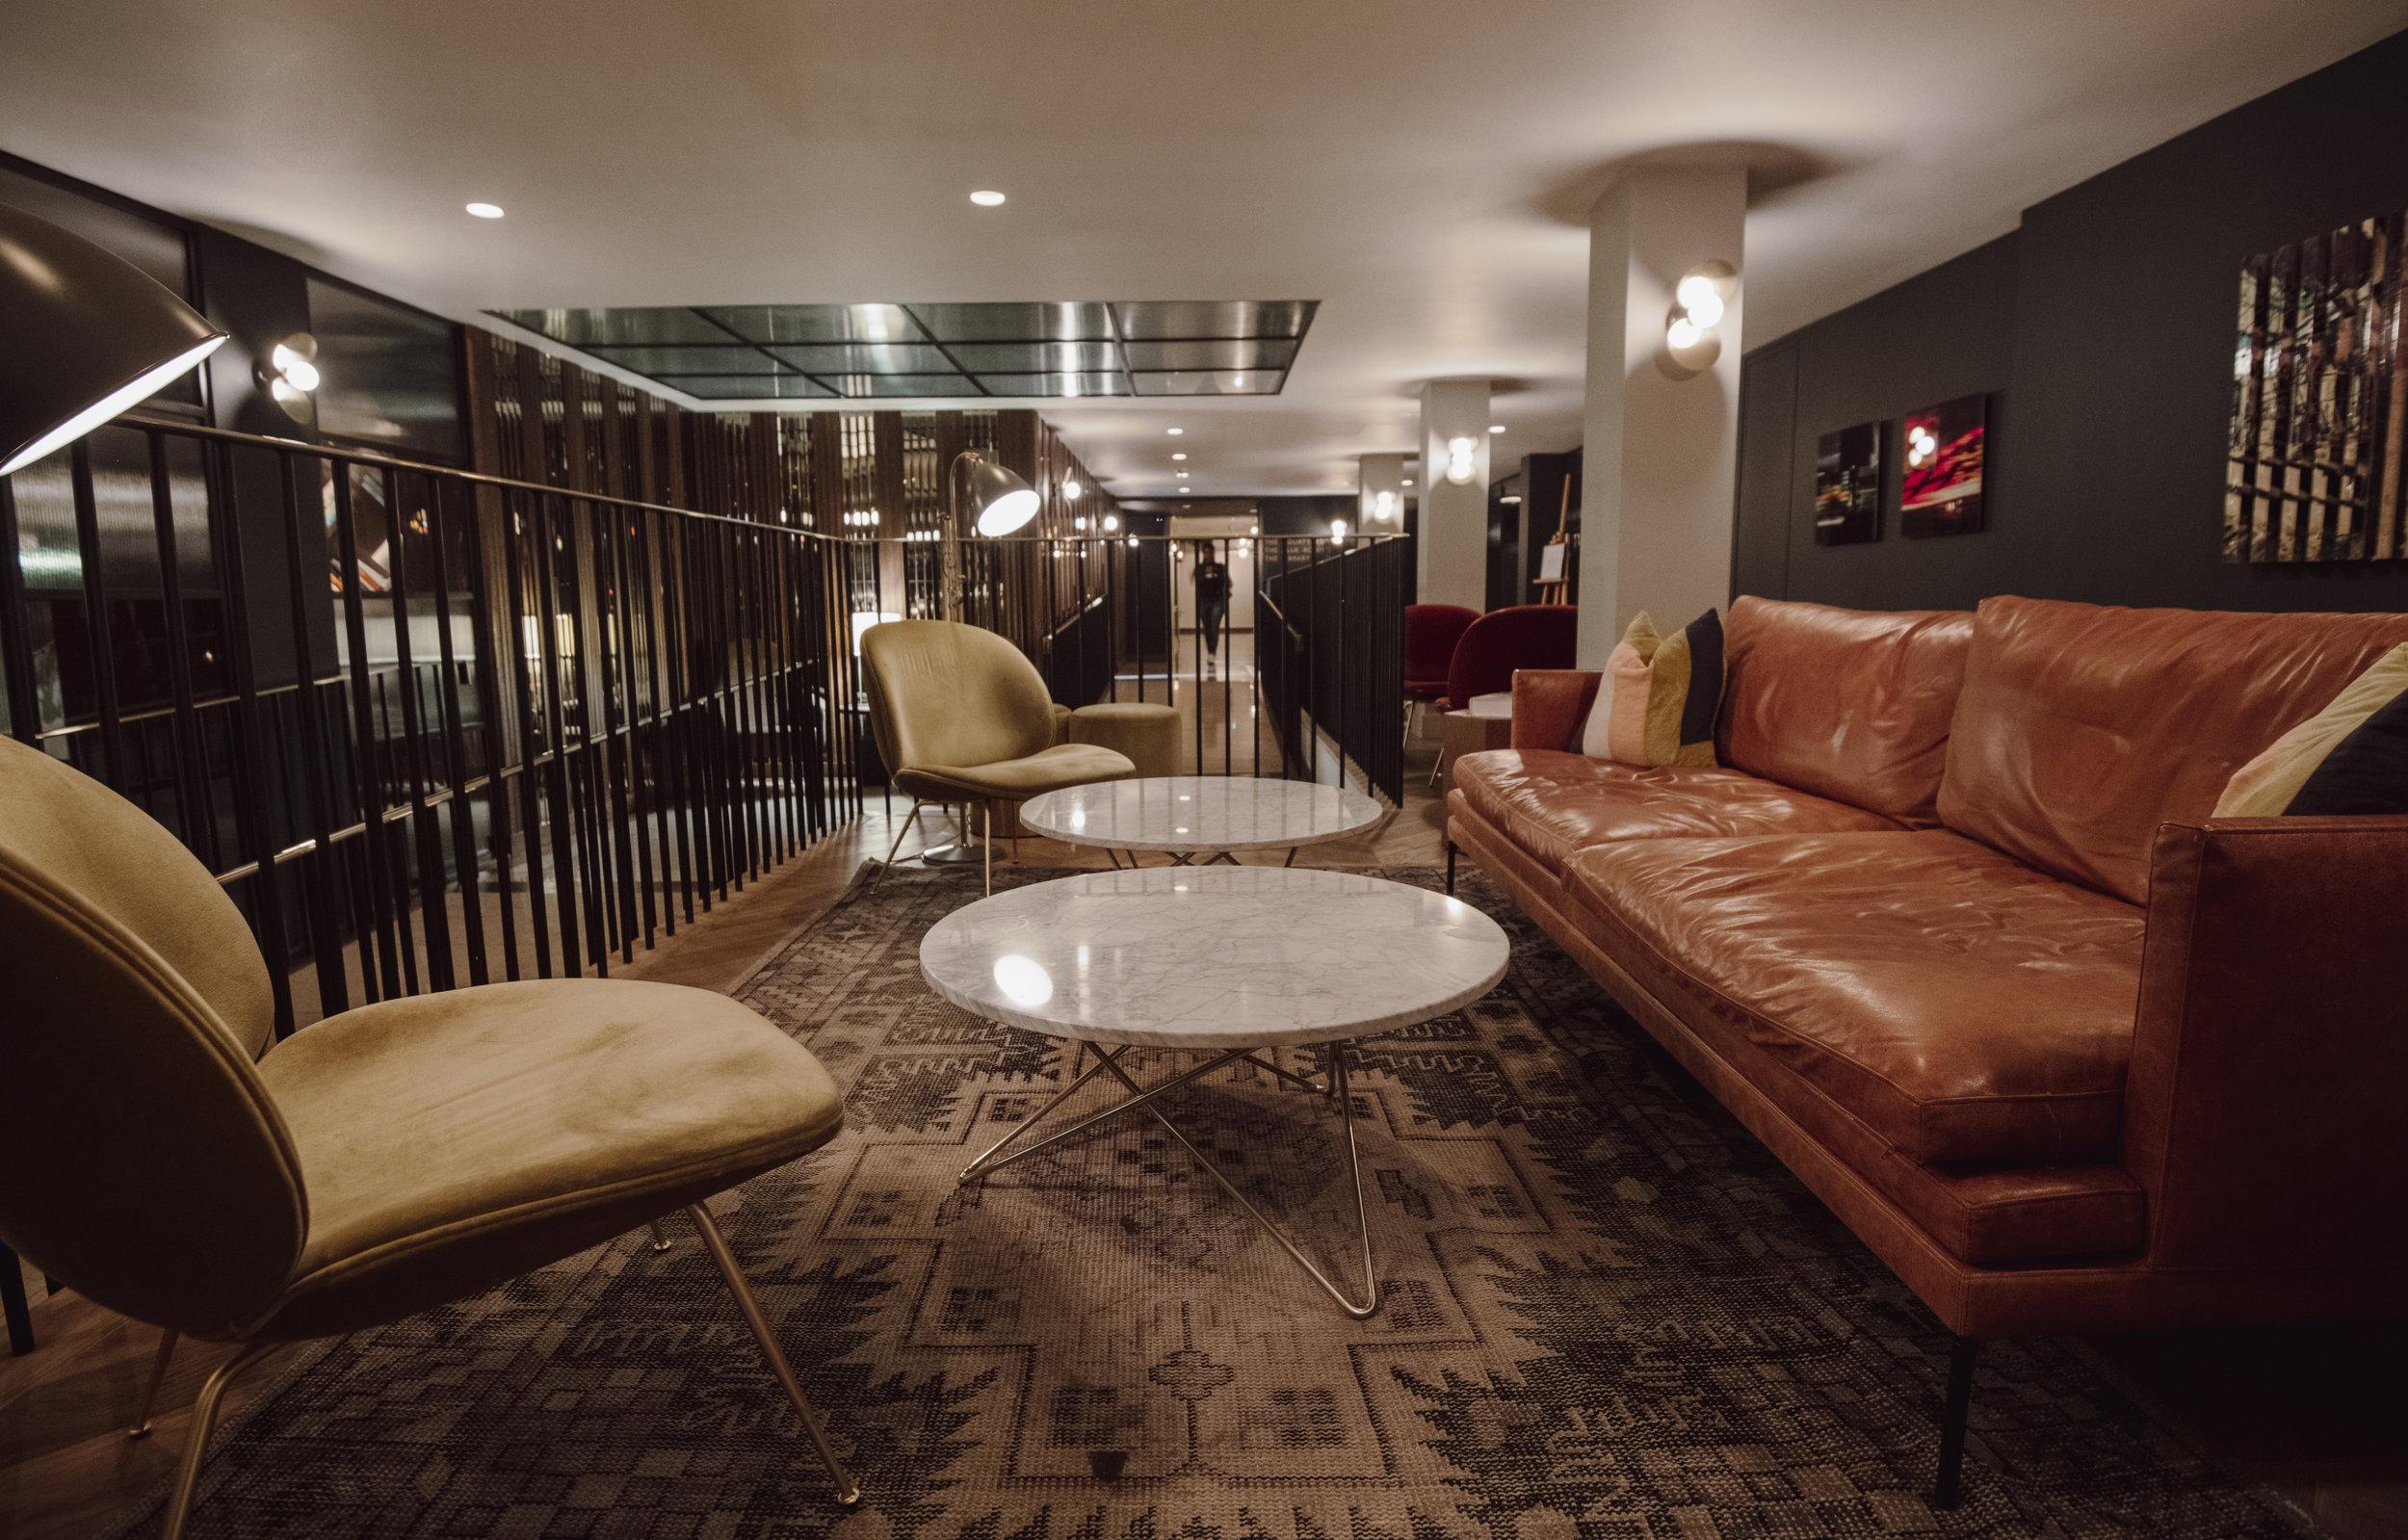 Hotel Marylebone | Nicole Bissey Photography 02.JPG